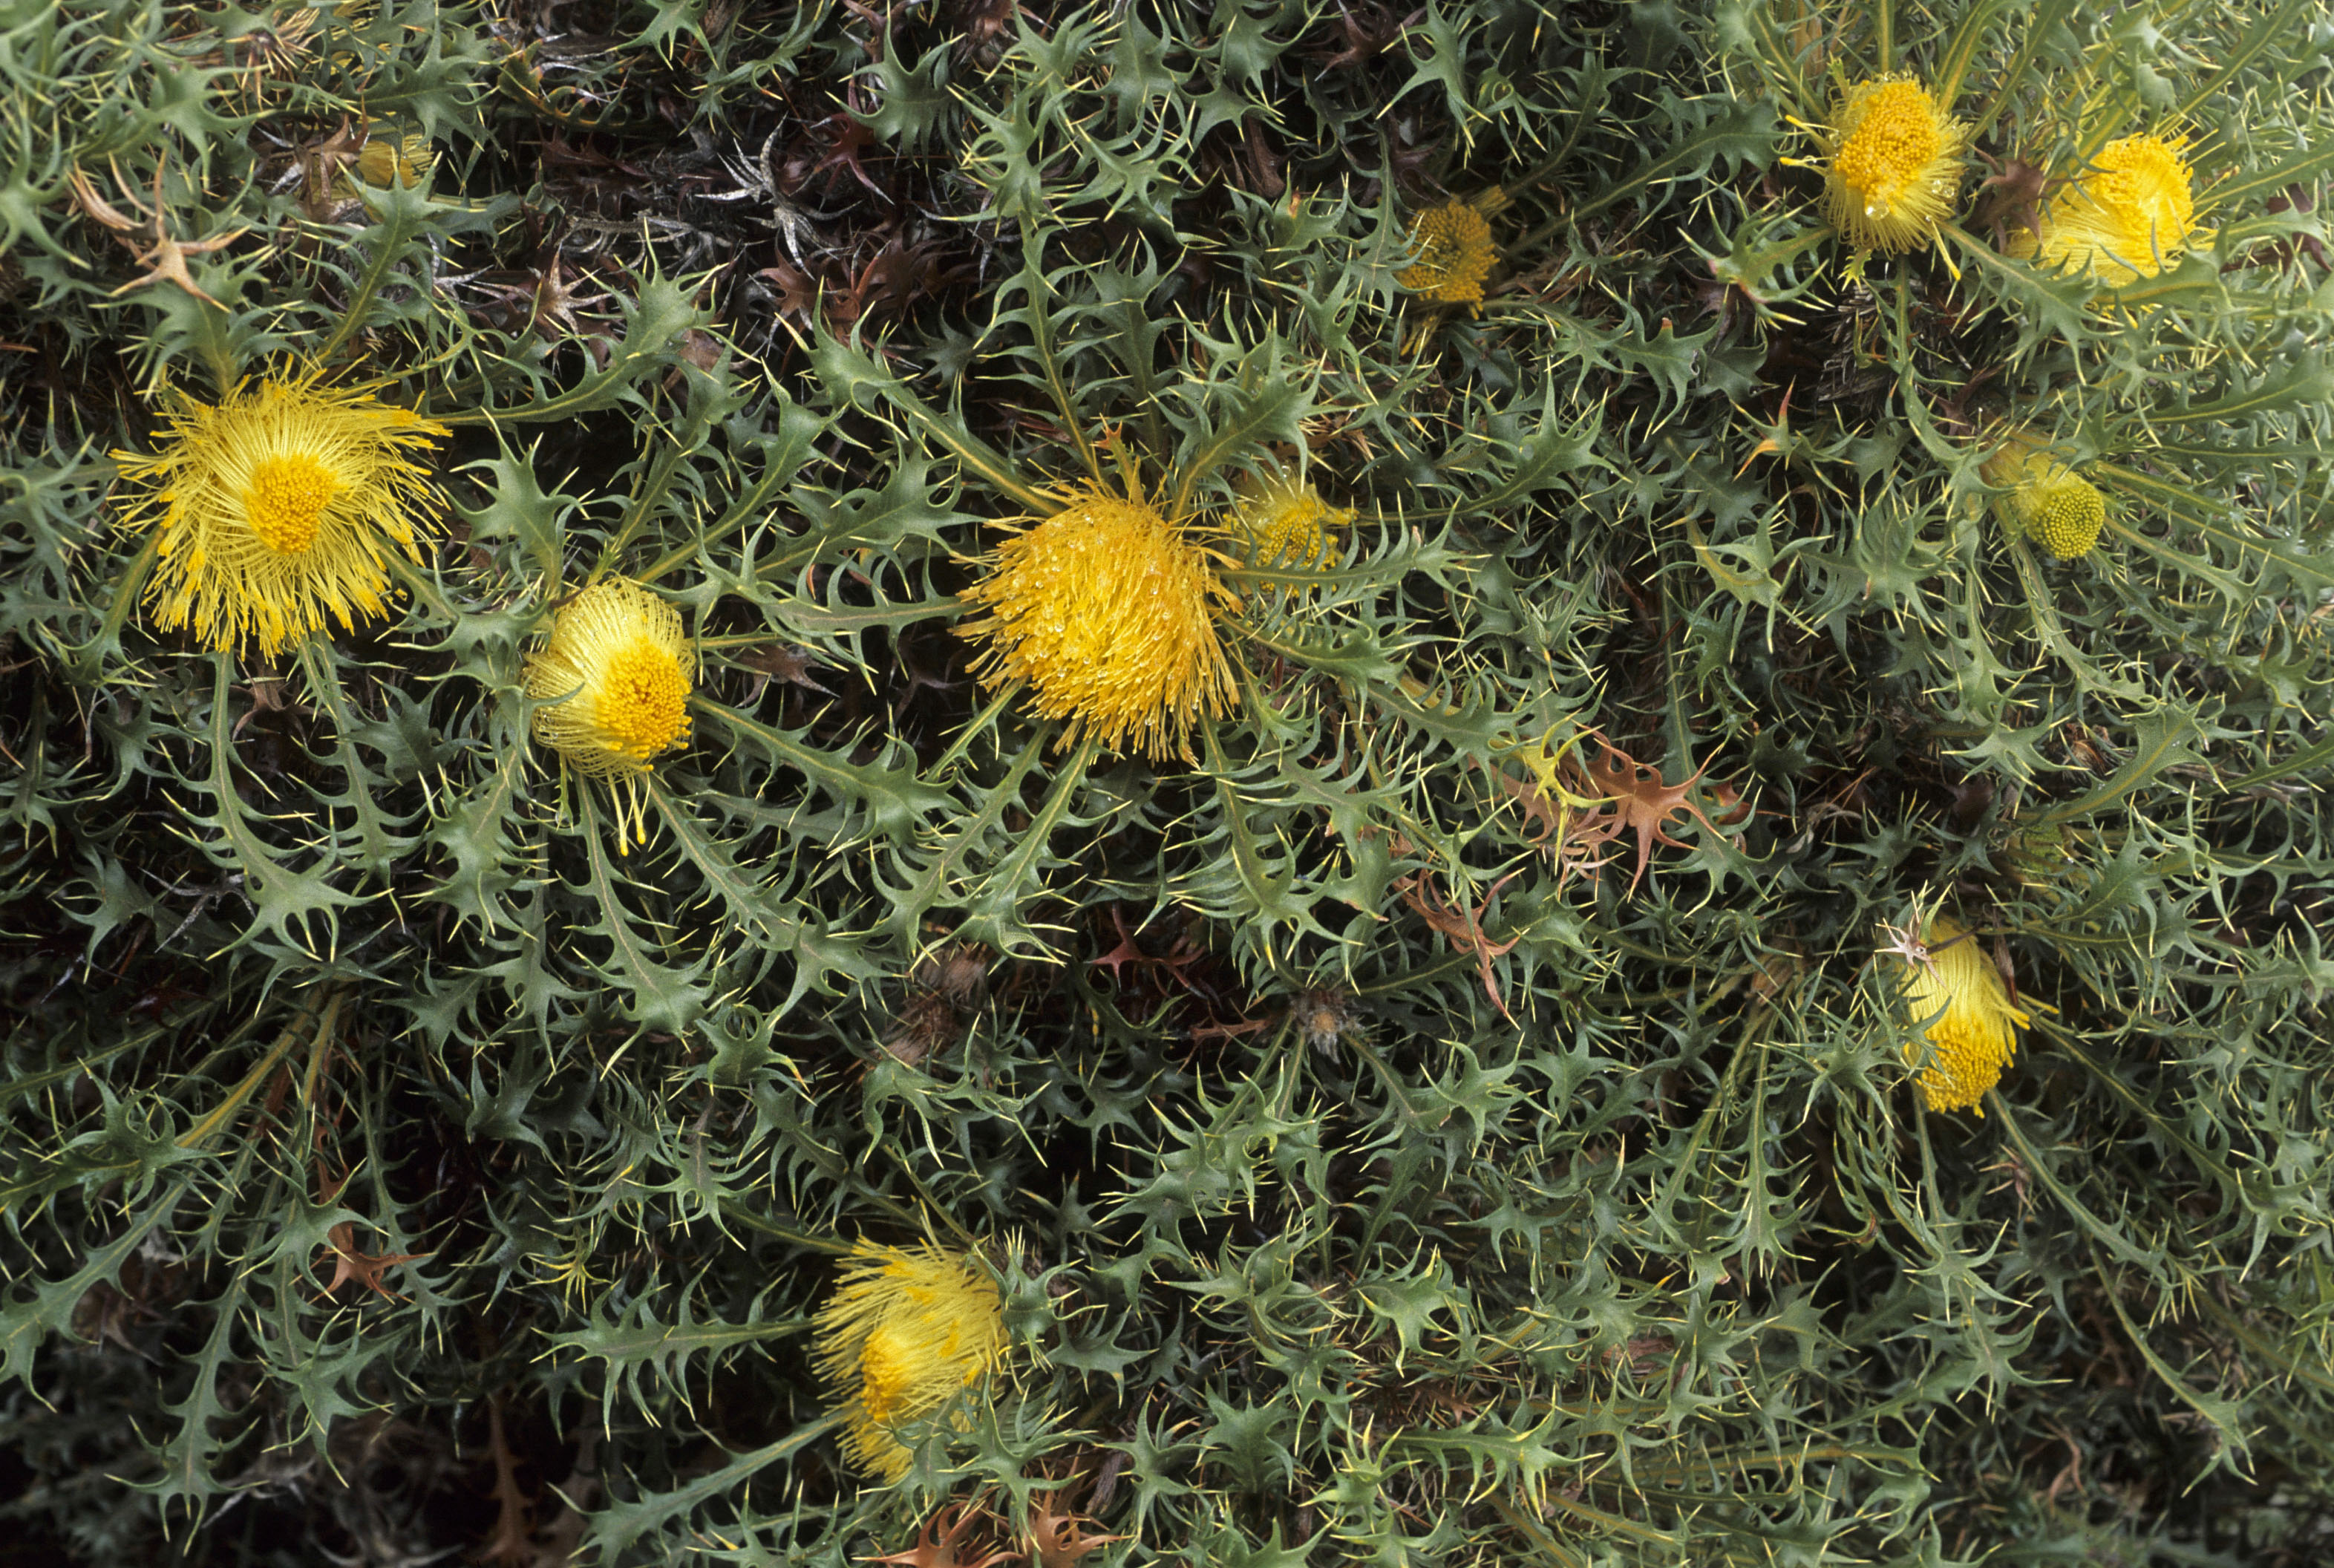 Dryandra falcata